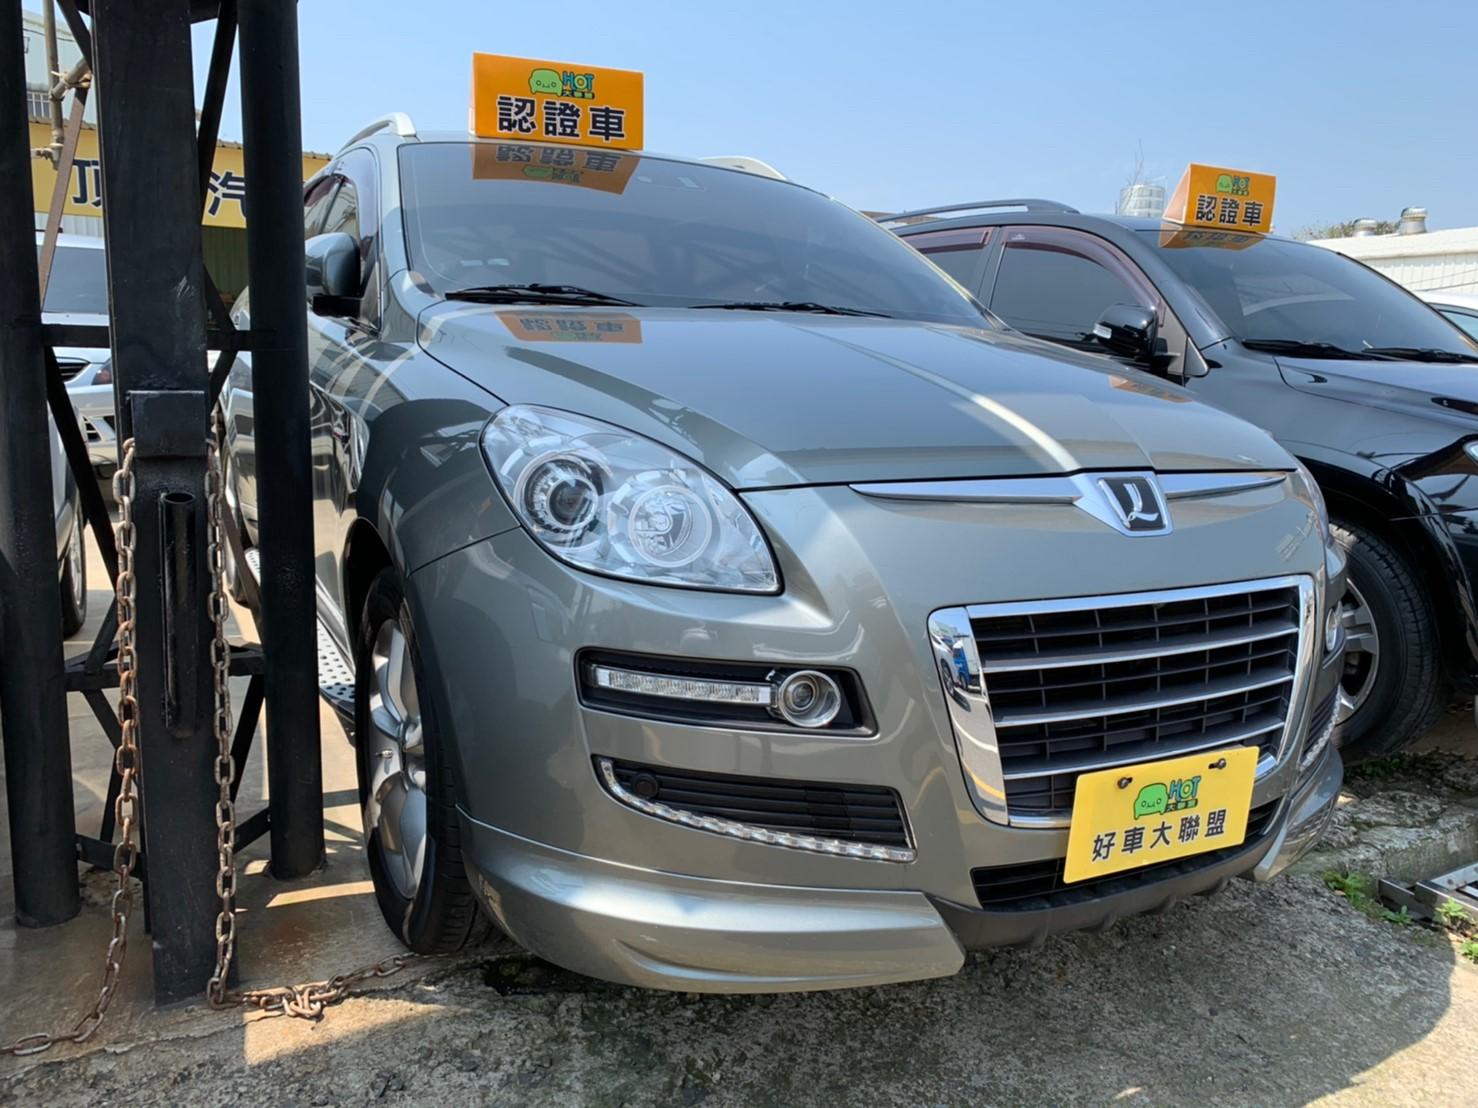 2012 Luxgen 納智捷 U7 Turbo